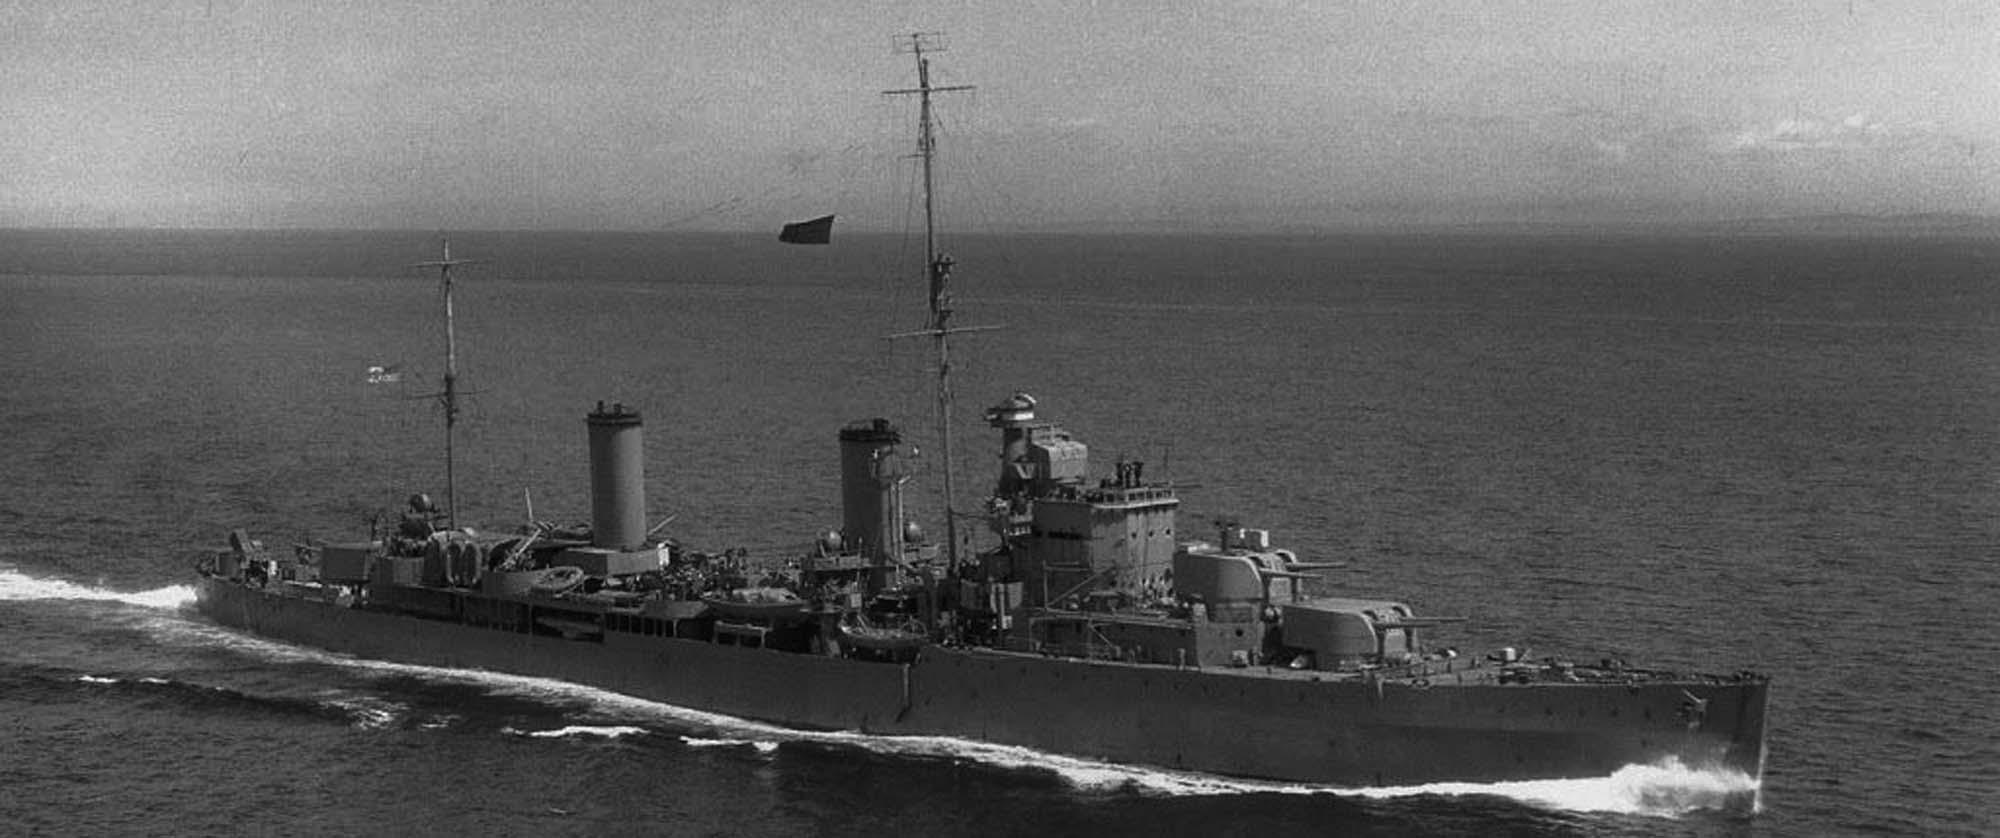 Arethusa class cruisers (1934)